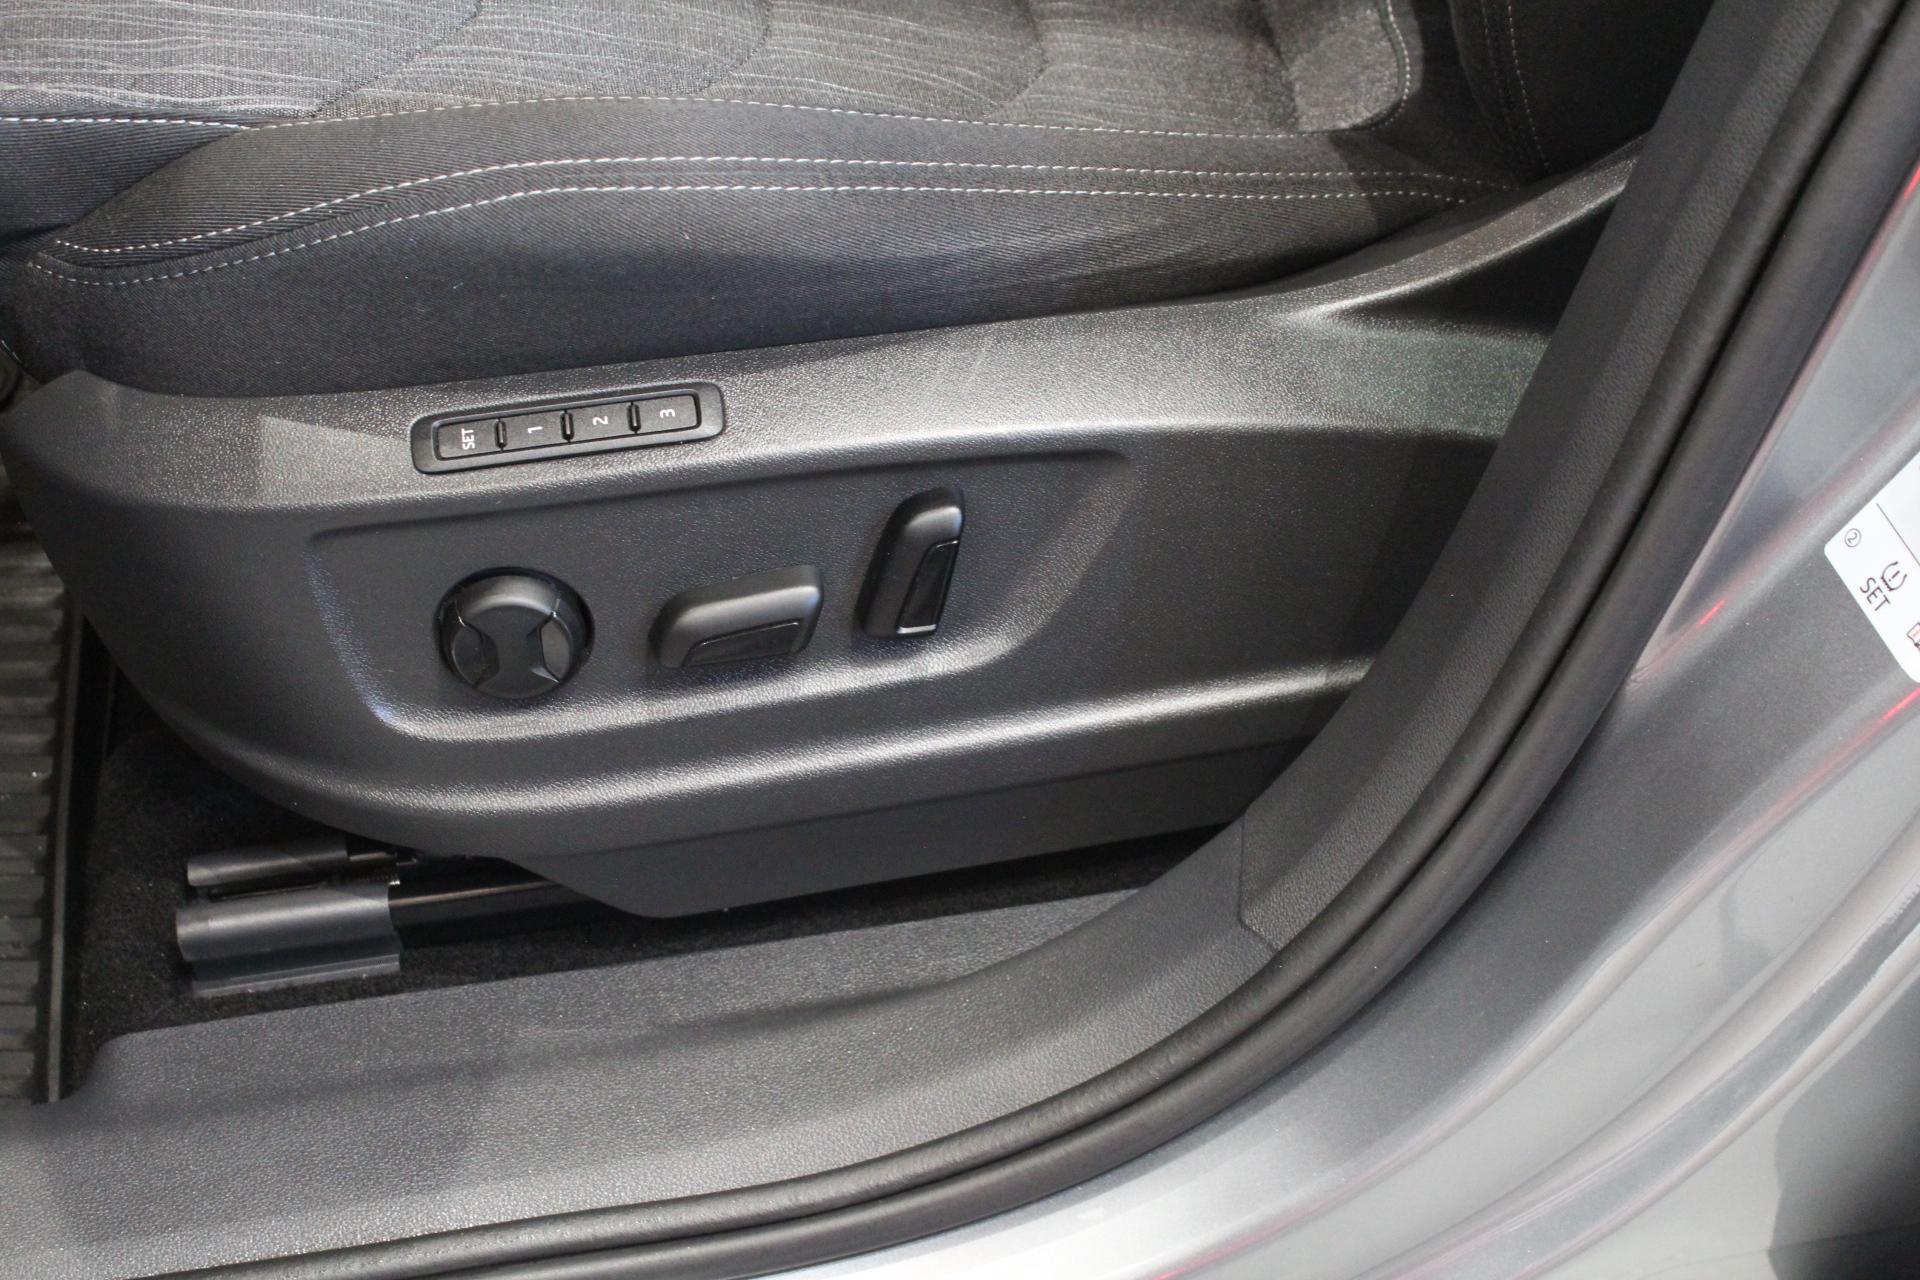 Škoda Kodiaq 2.0 TDI DSG 140kW Style - AutoBrela obrázek